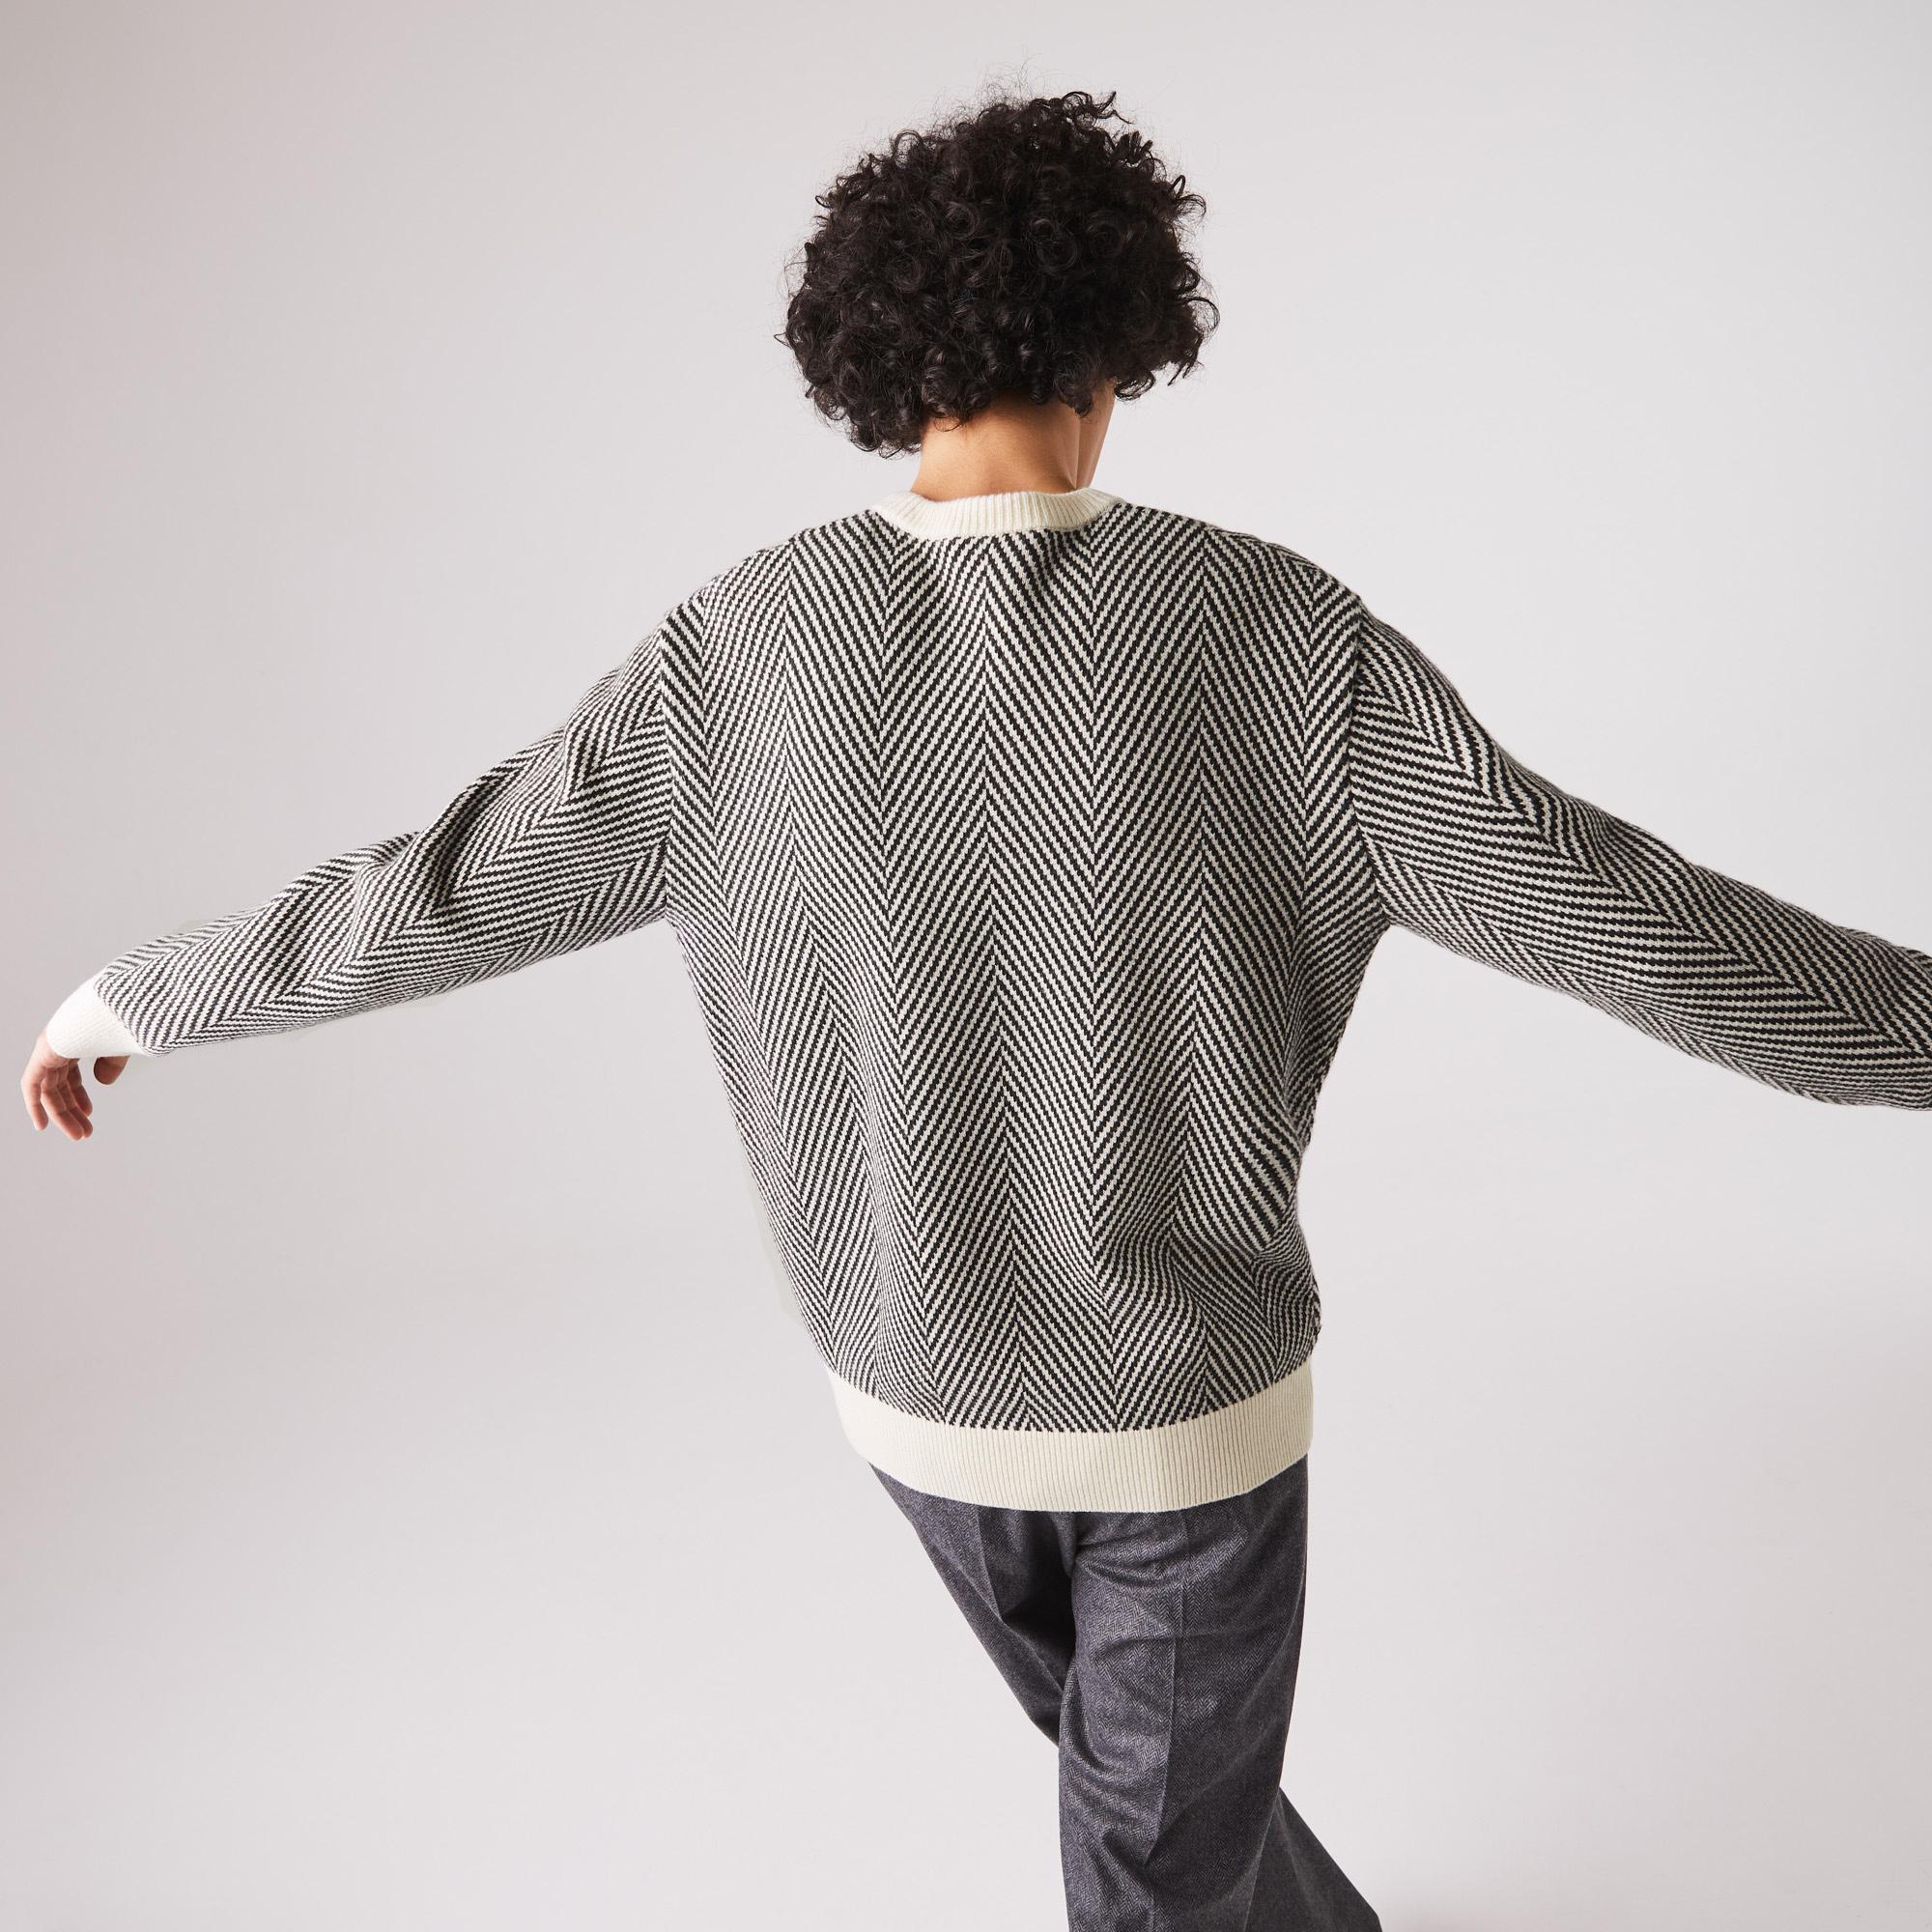 Lacoste Men's Textured Eco-Friendly Wool Crew Neck Sweater